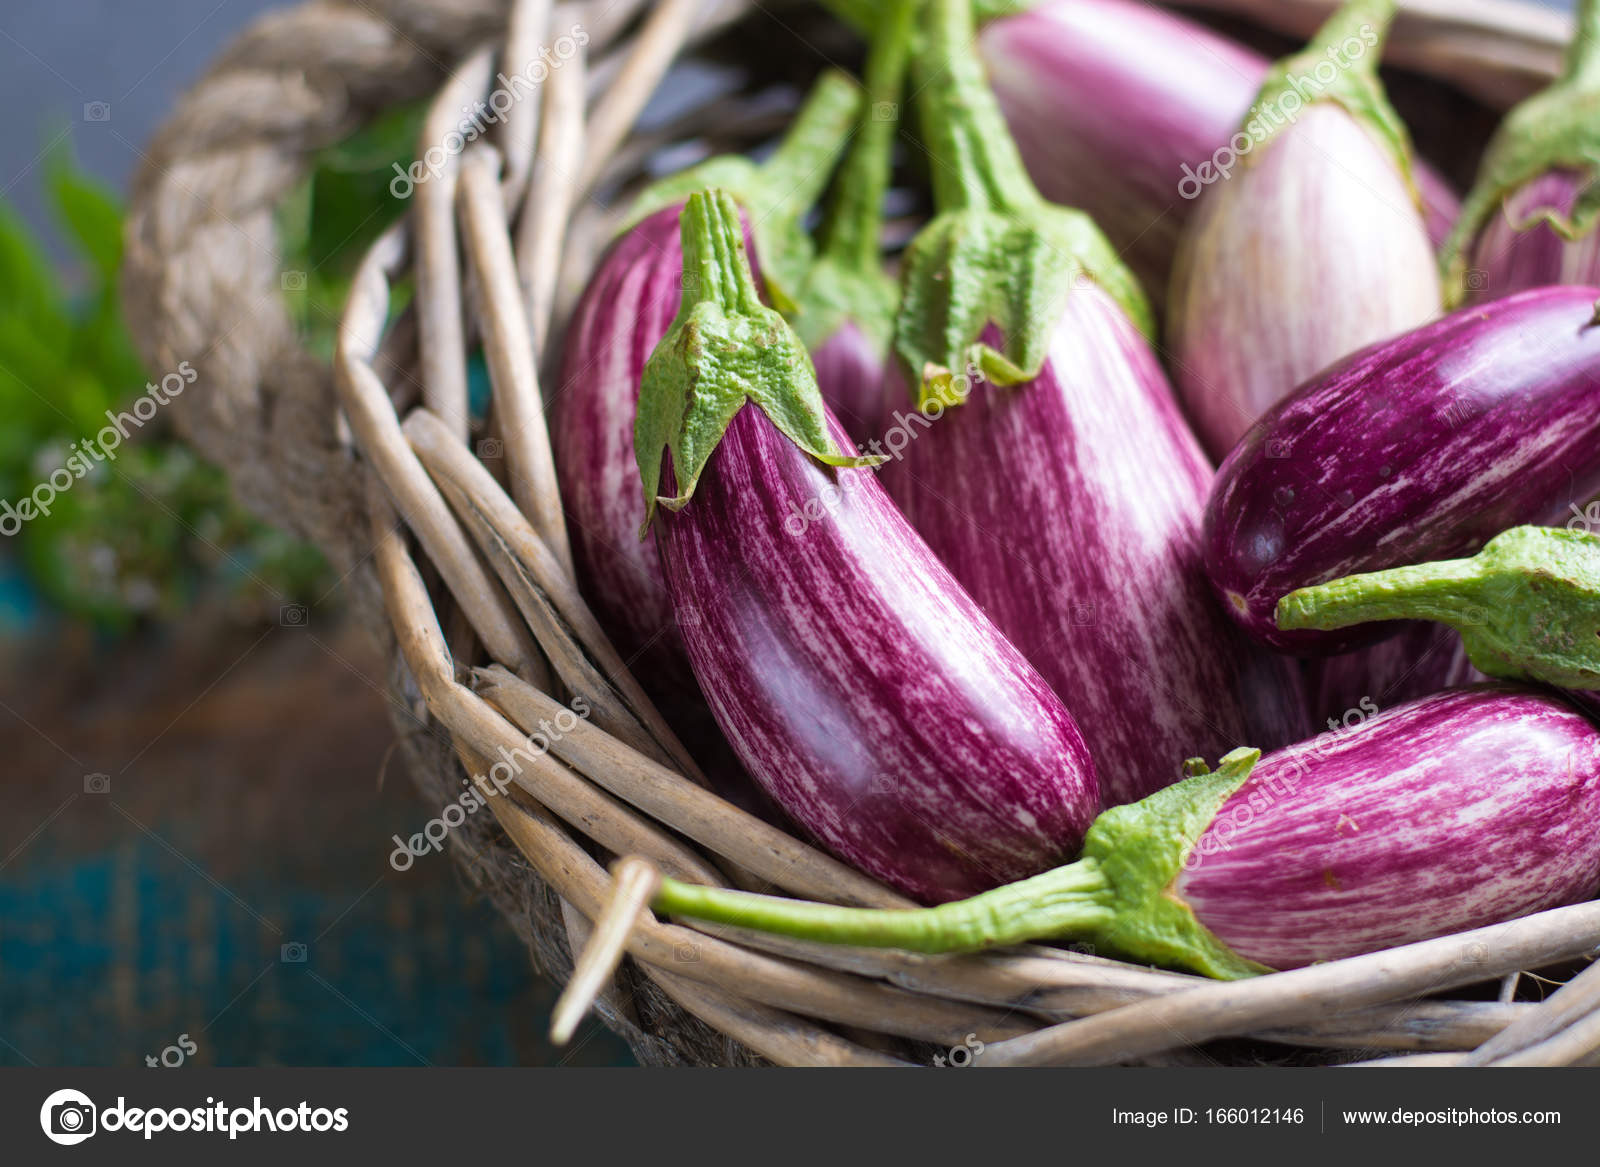 vegetarian menu template small fresh eggplants on wooden table